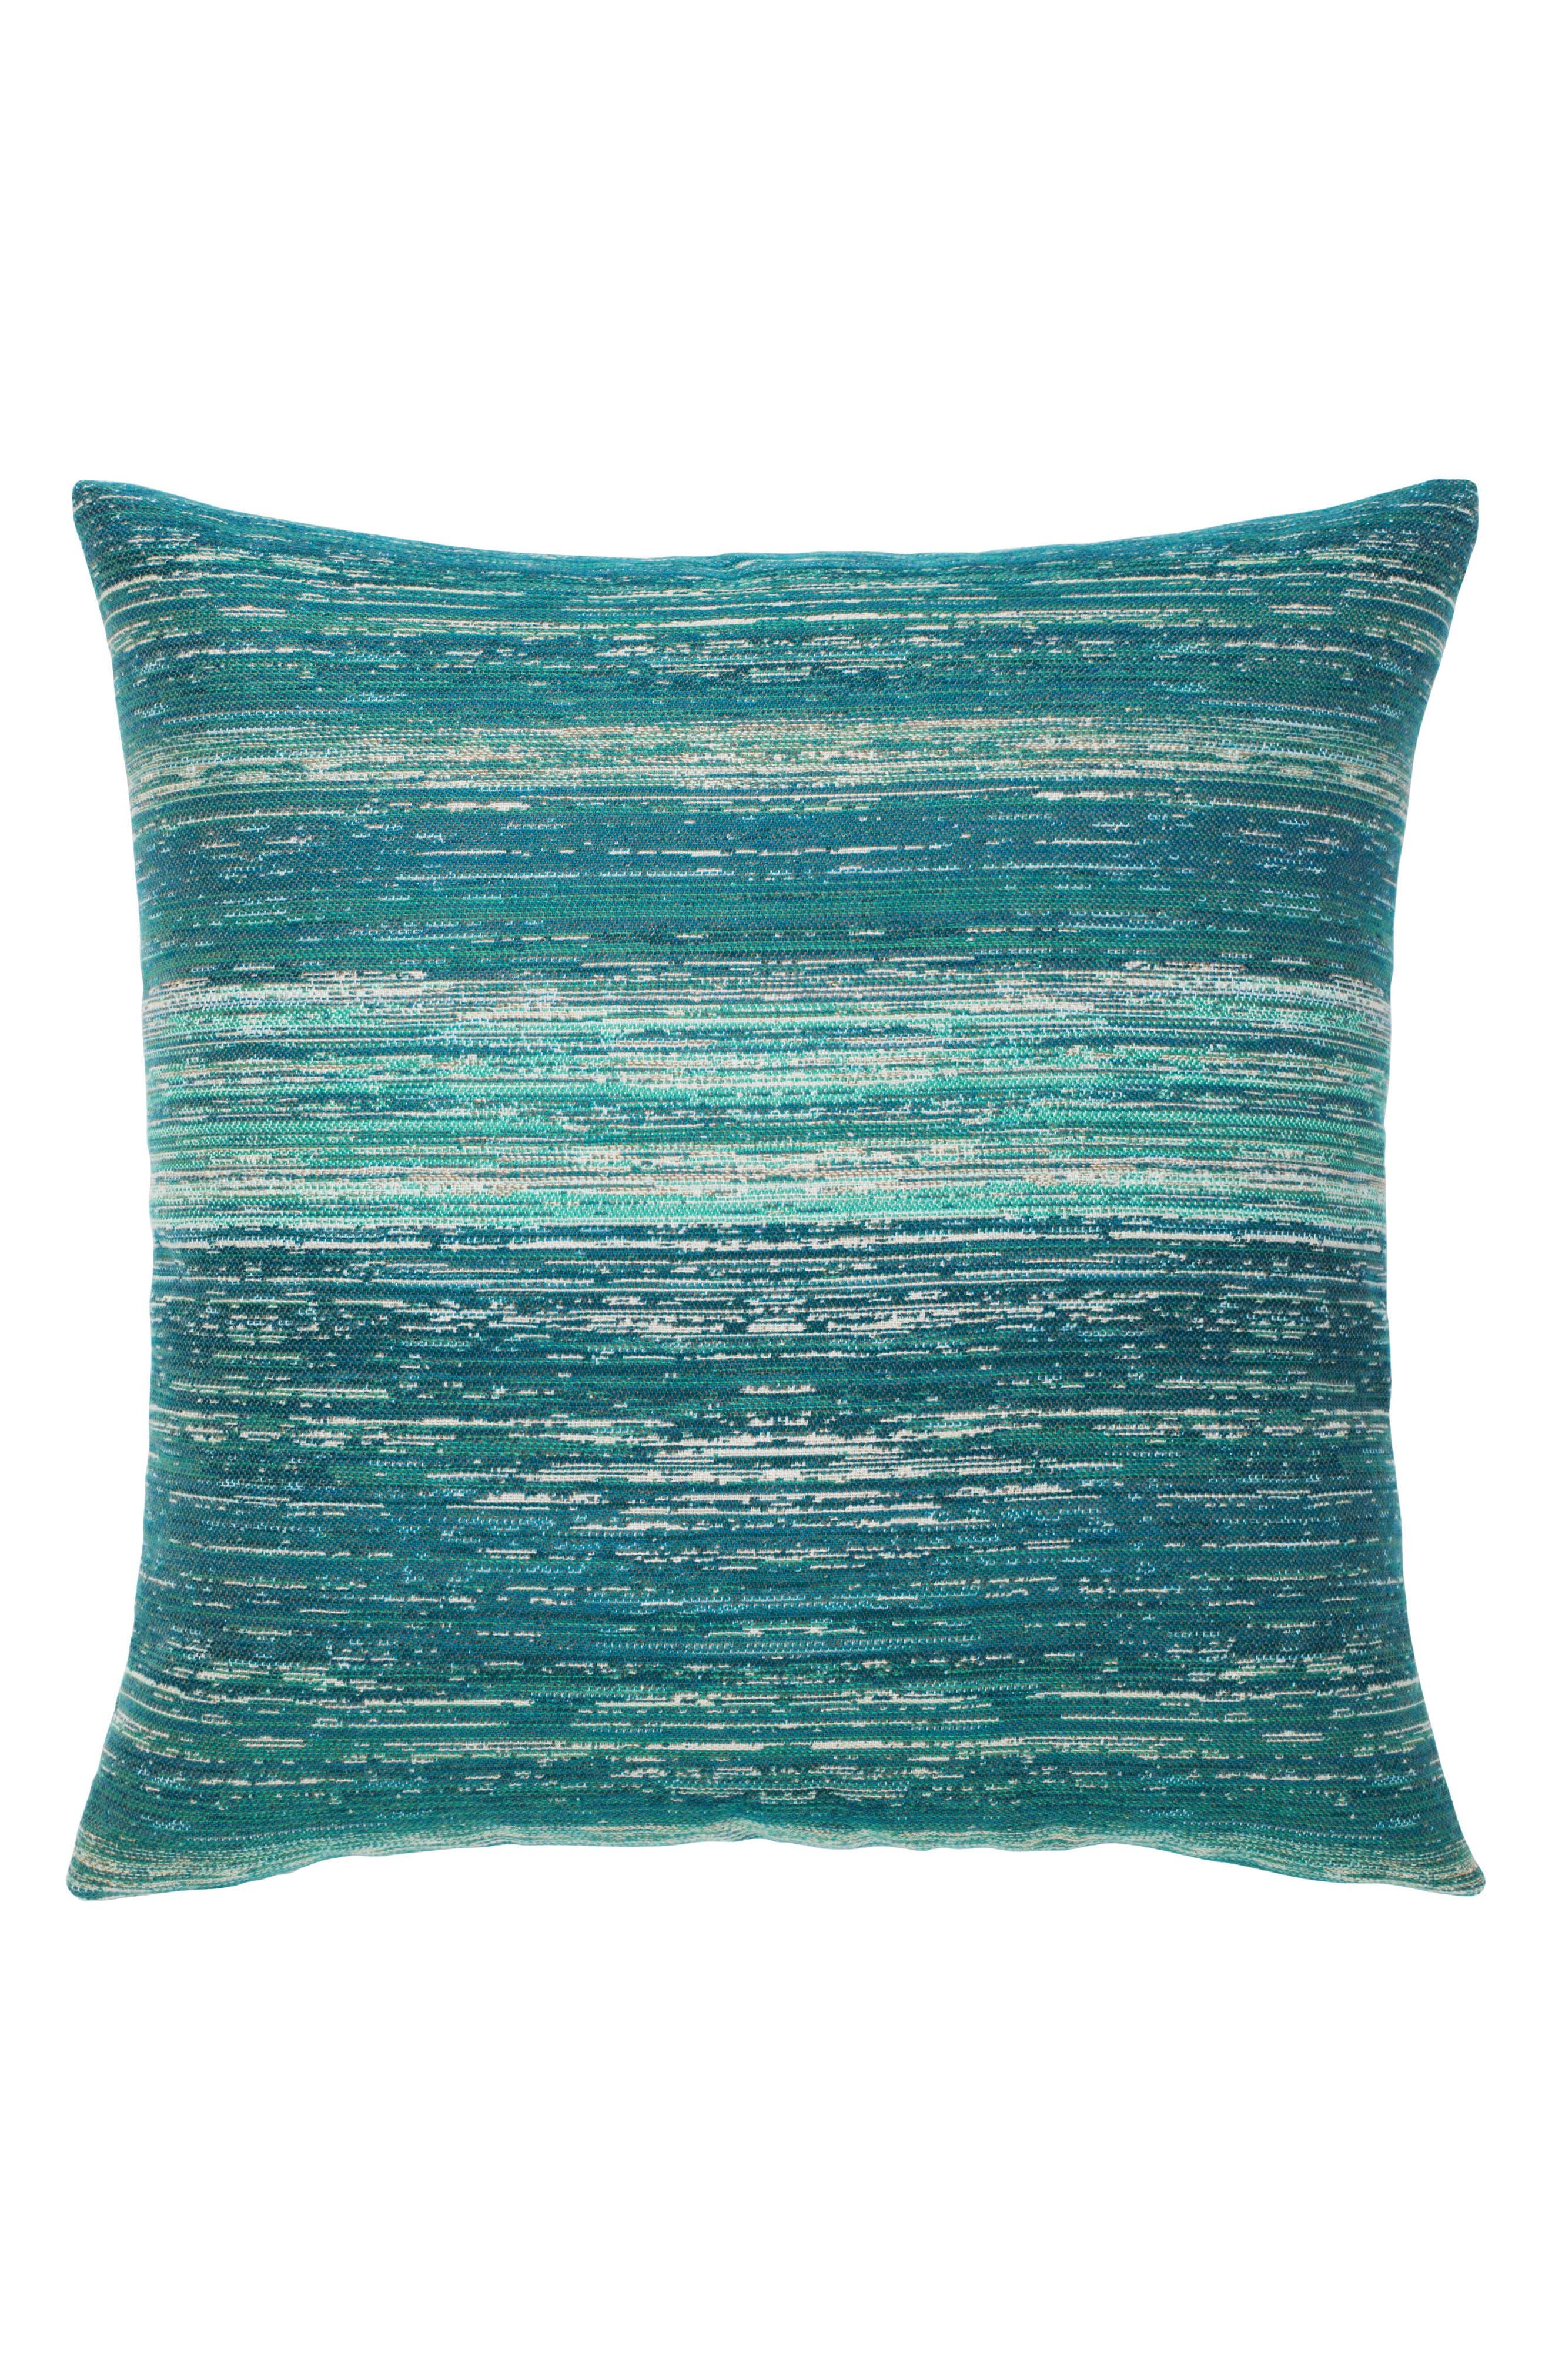 Texture Lagoon Accent Pillow,                             Main thumbnail 1, color,                             BLUE